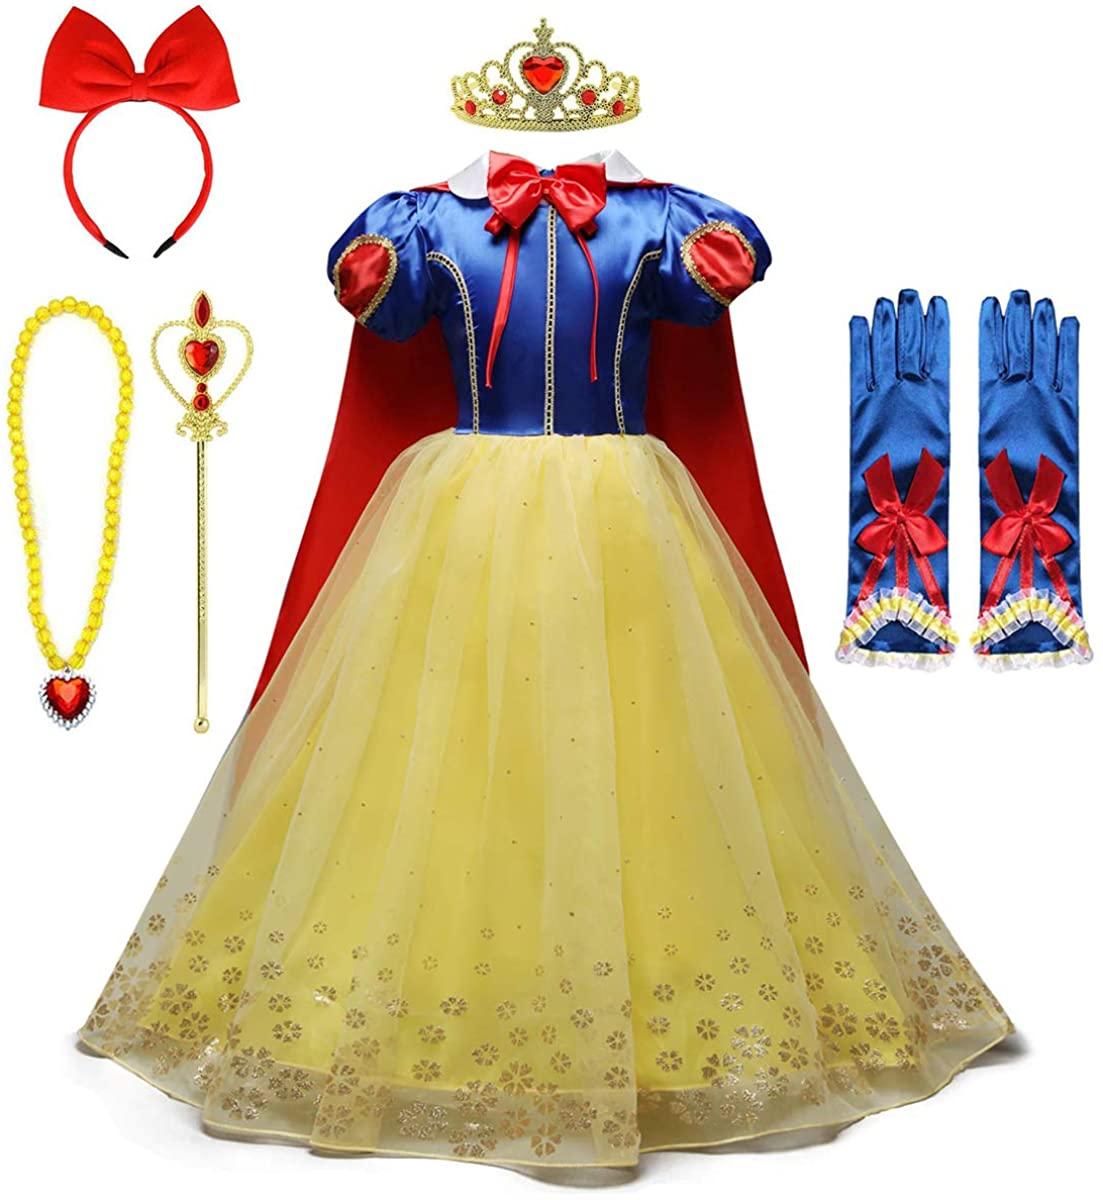 MYRISAM Snow White Princess Dress Up Costume Girls Halloween Carnival Cosplay Christmas Birthday Dress w/Cloak Headband